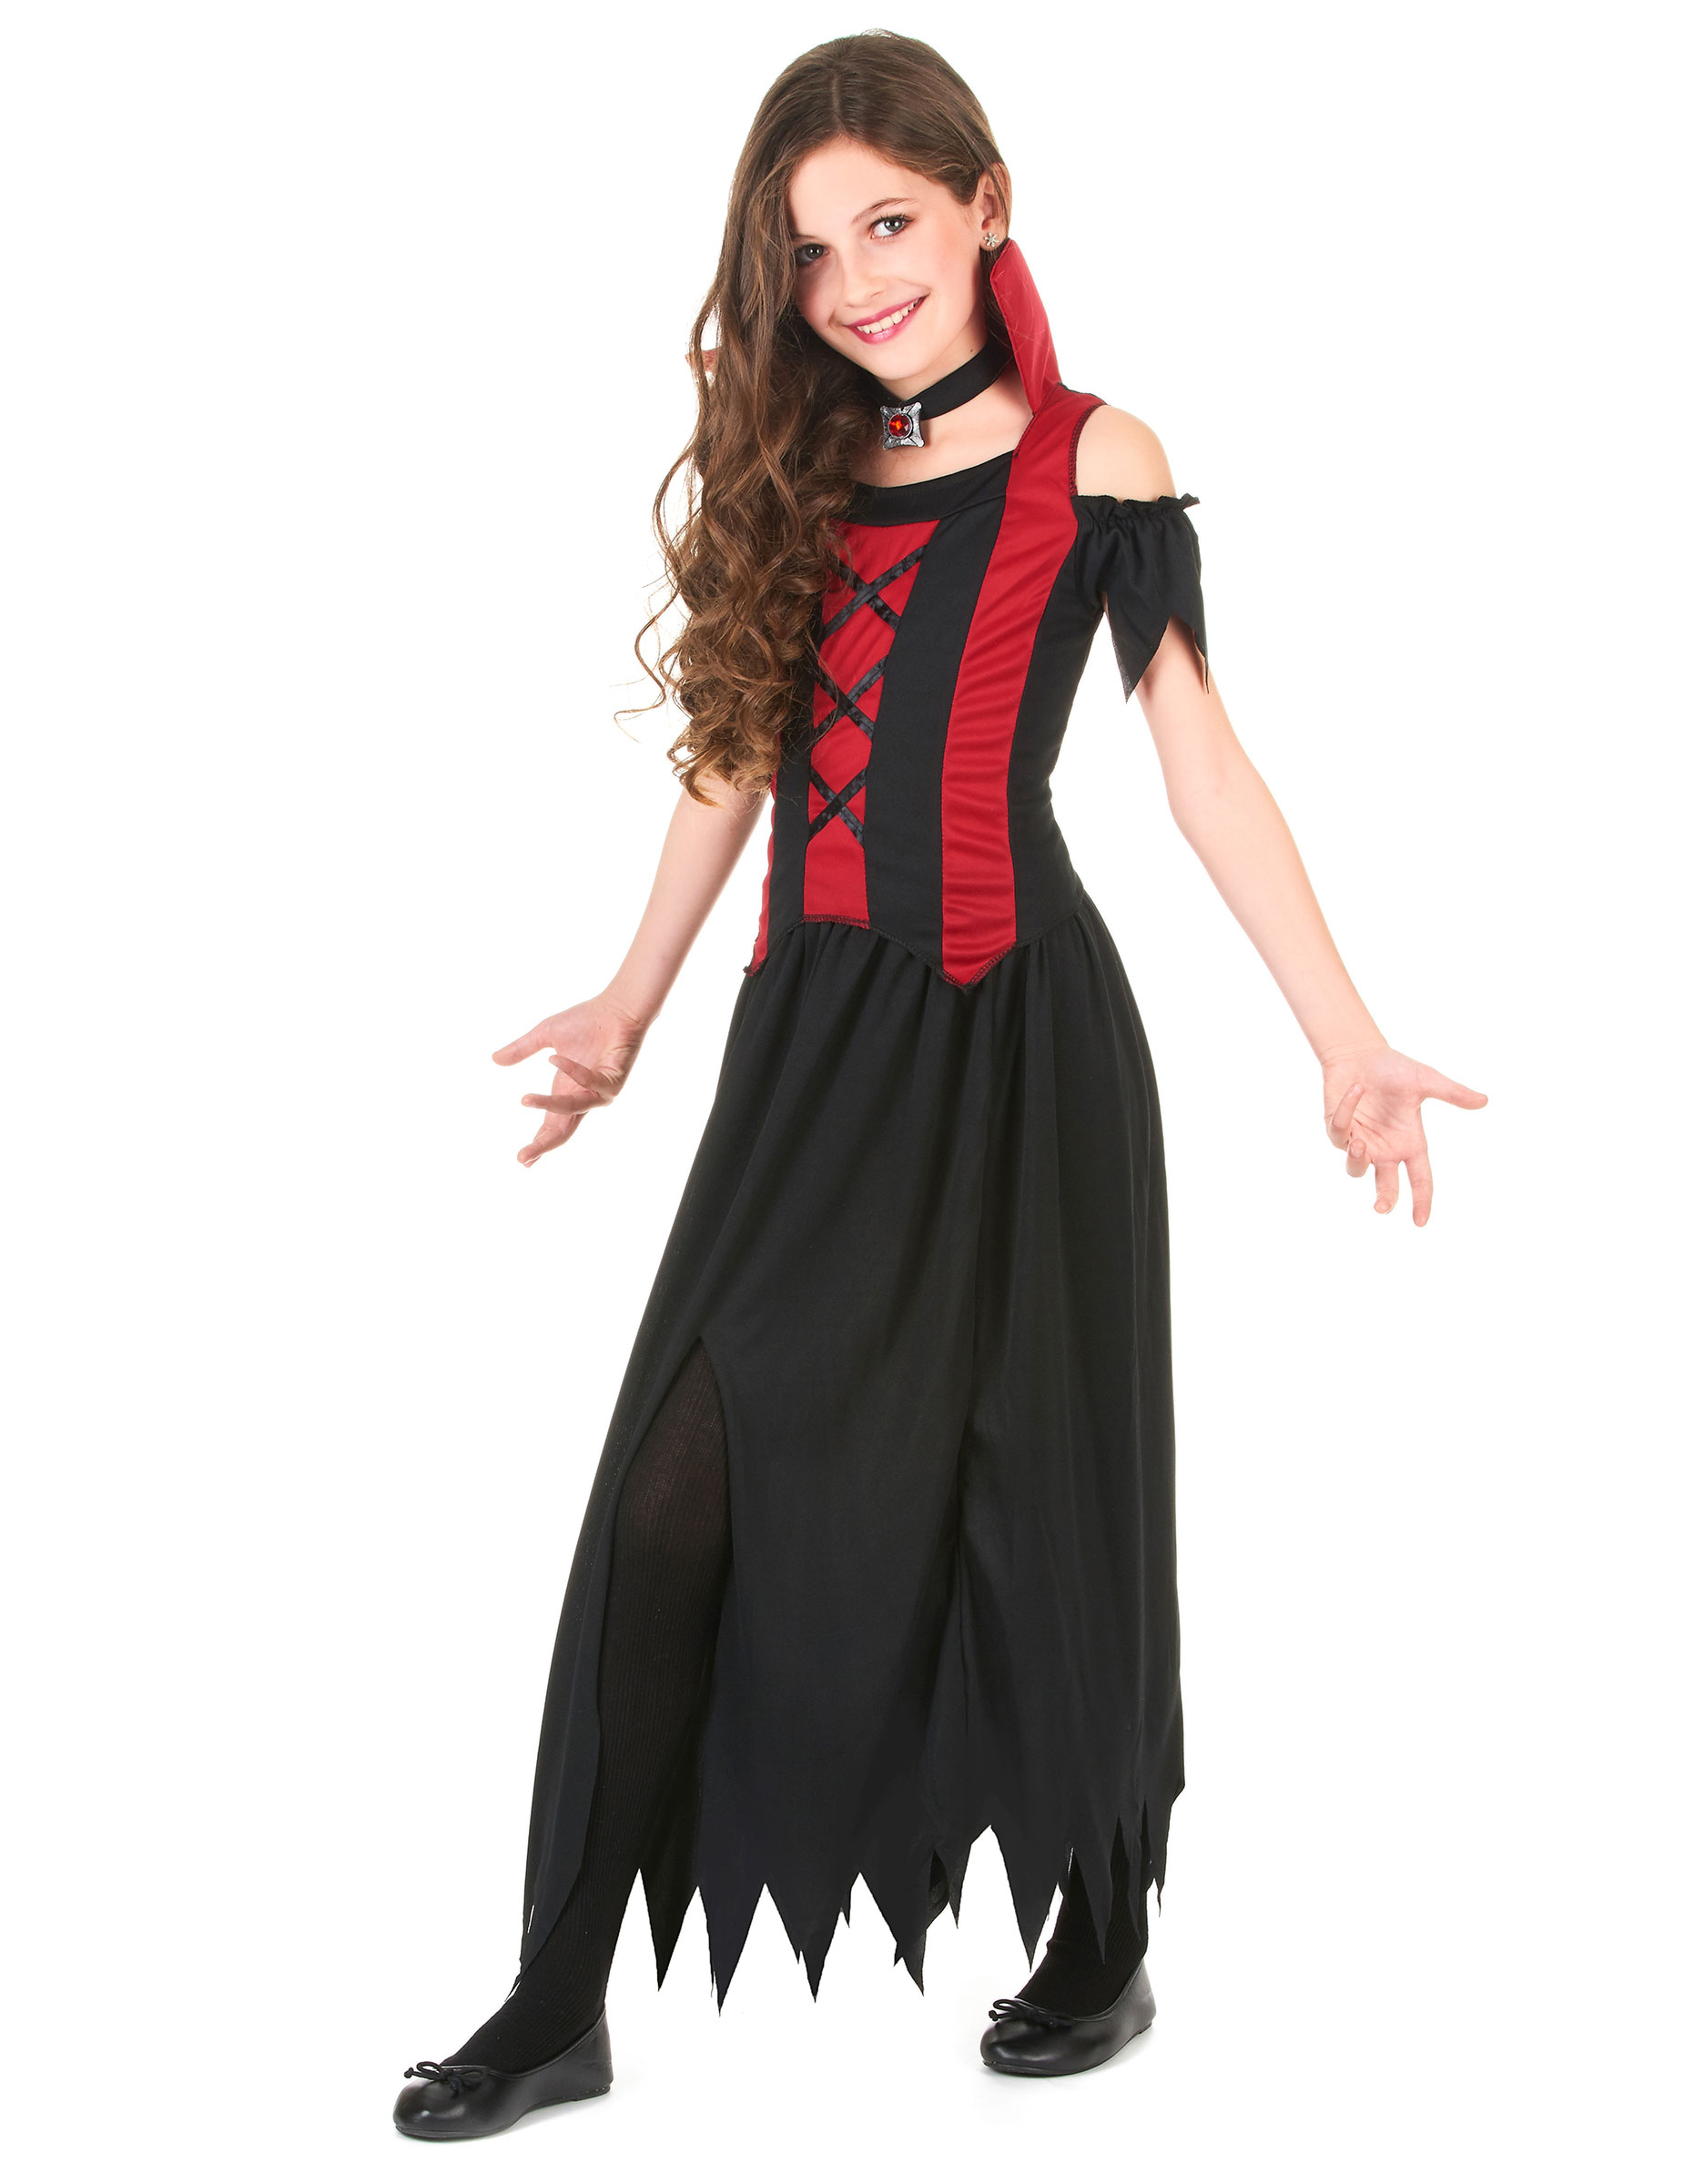 Halloween Verkleedkleding Kind.Halloween Kostuums Voor Kinder Halloween Feestkleding Voor